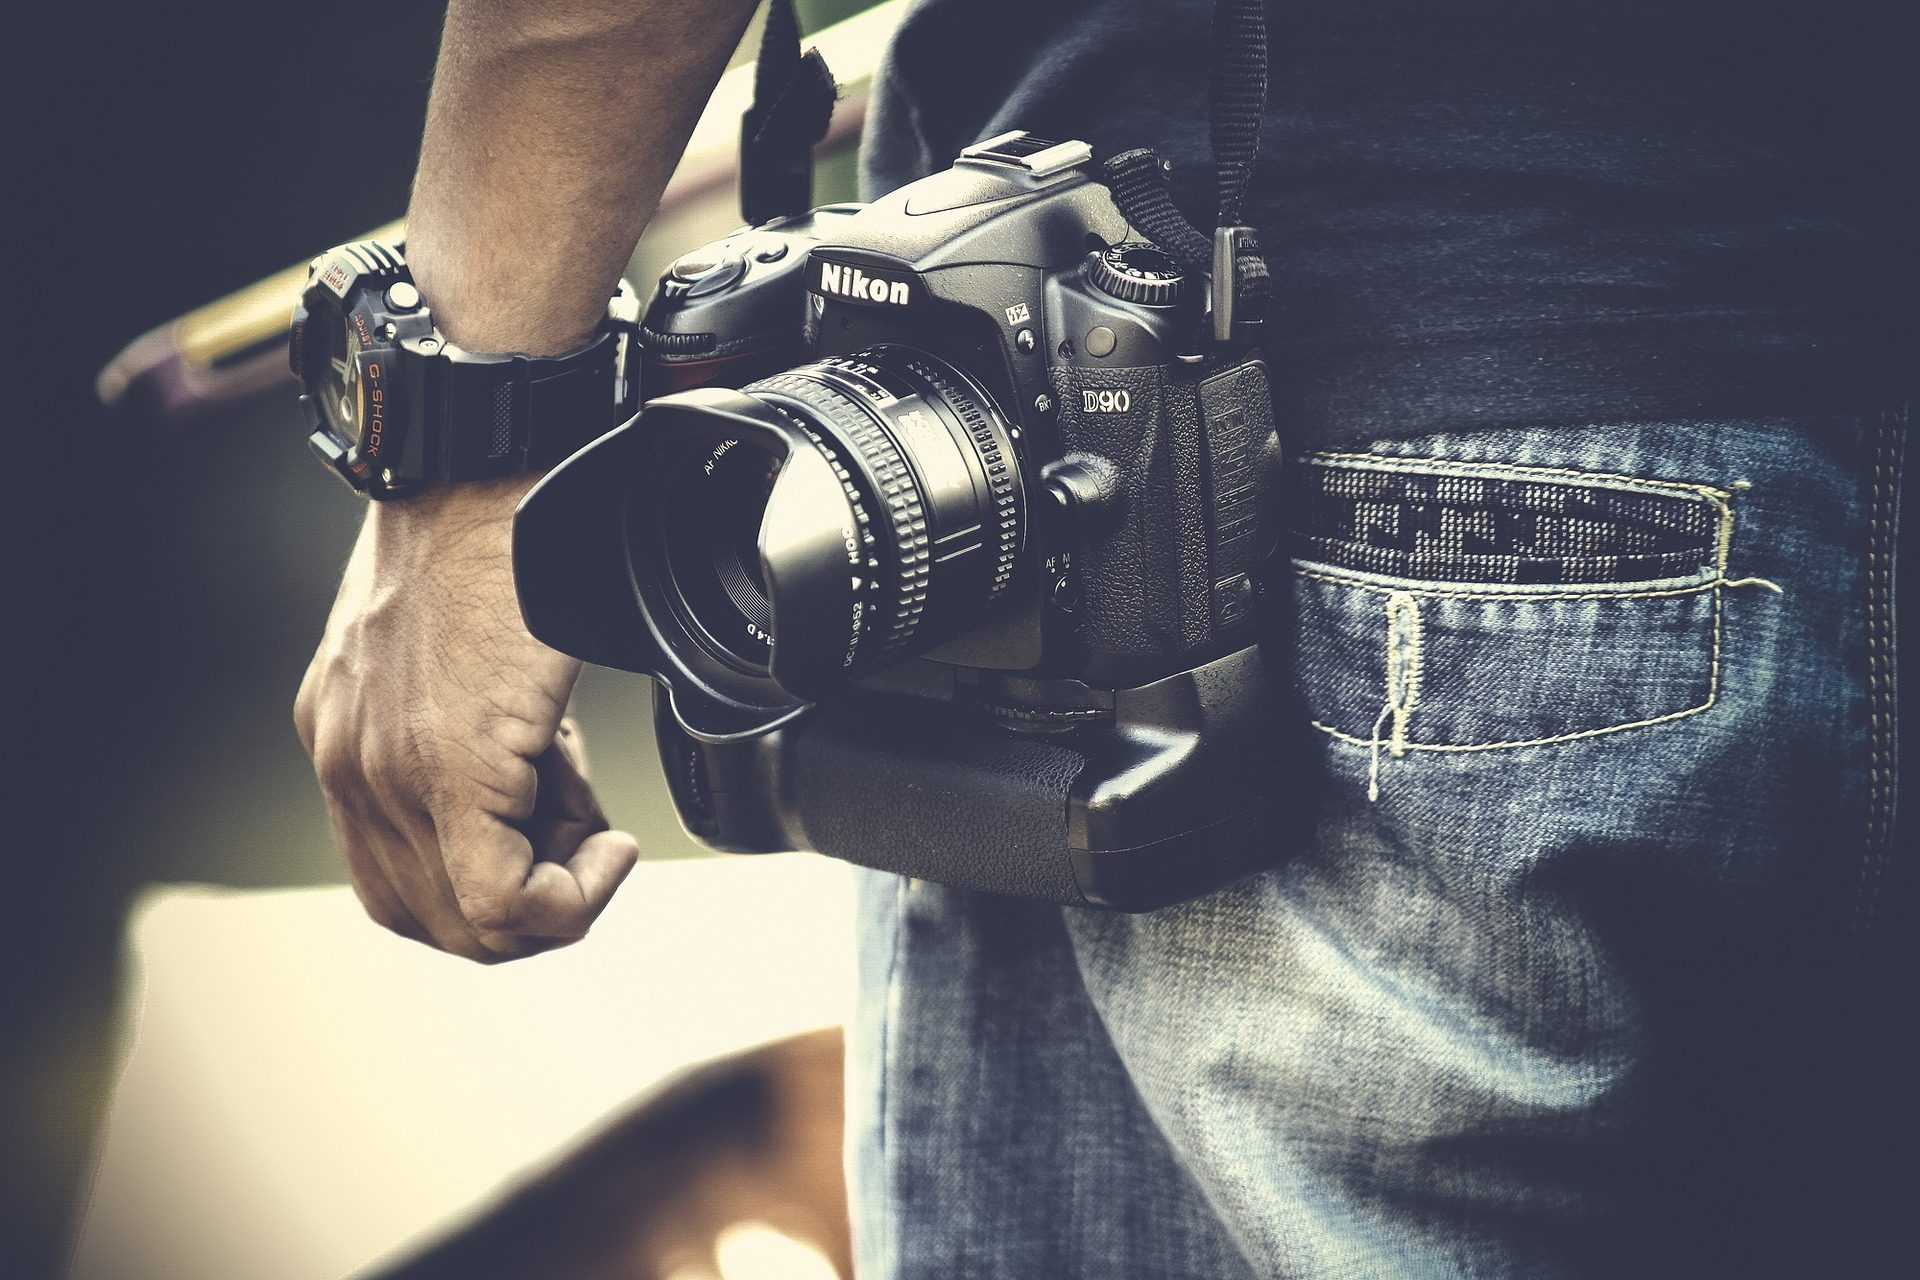 cámara, fotográfica, hombre, fotógrafo, reflex, mano, reloj - Fondos de Pantalla HD - professor-falken.com